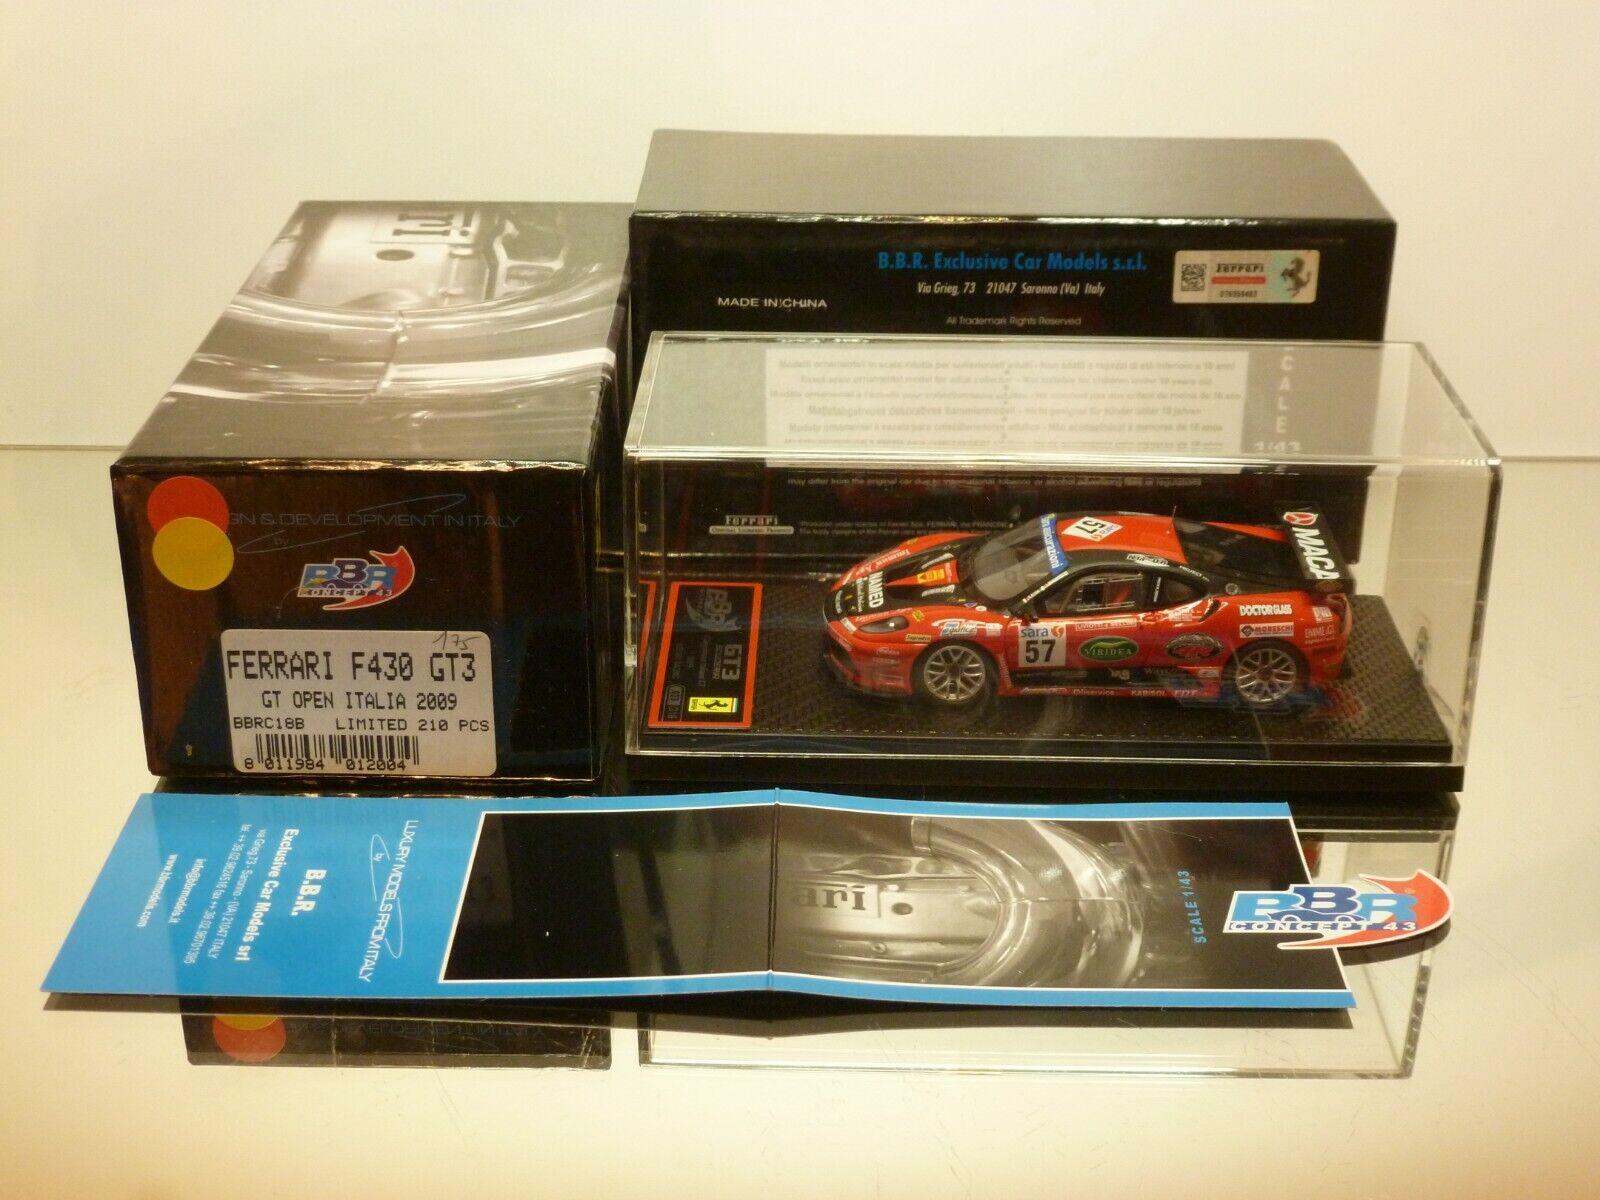 BBR MODELS FERRARI GT3 SCUDERIA - CHAMPION ITALIAN  GT'09 1 43 - EXCELLENT IN BOX  sortie de vente pas cher en ligne